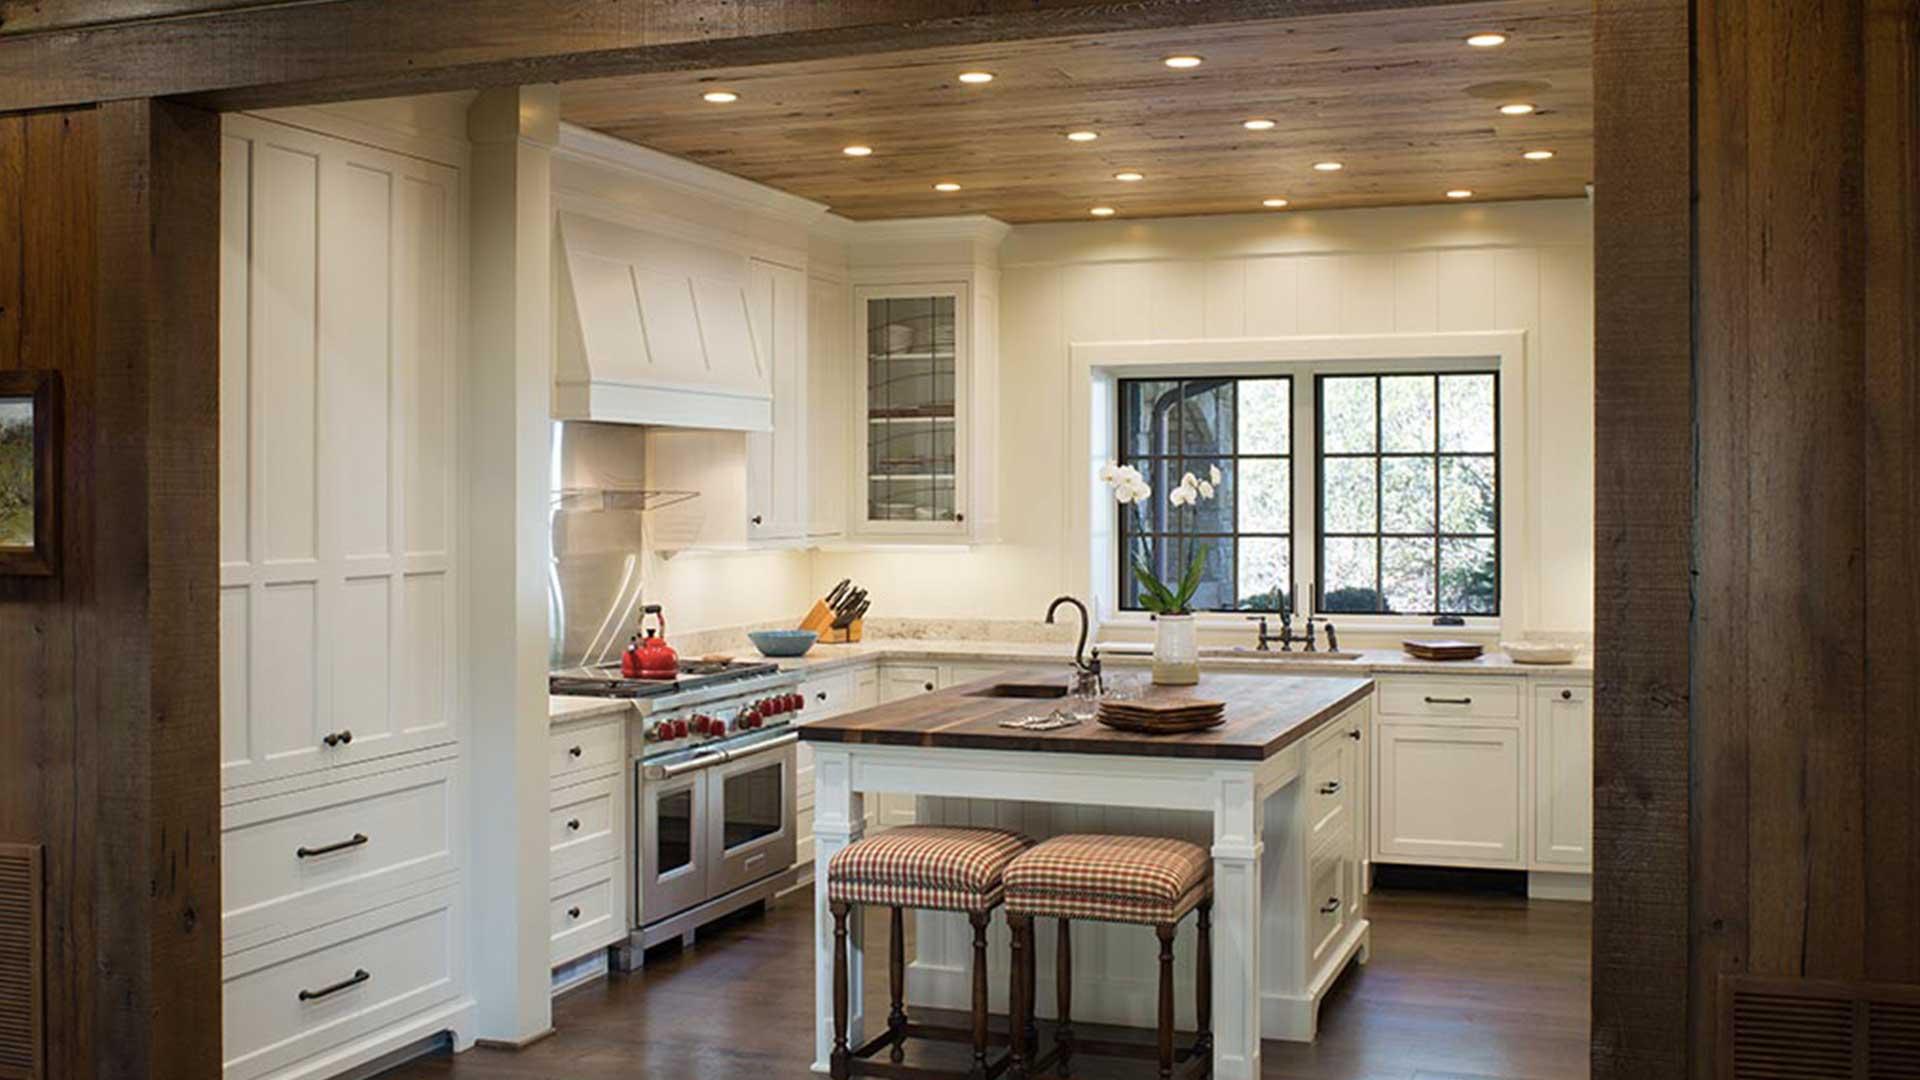 Shiloh Cabinets Asheville - Keystone Kitchen and Bath